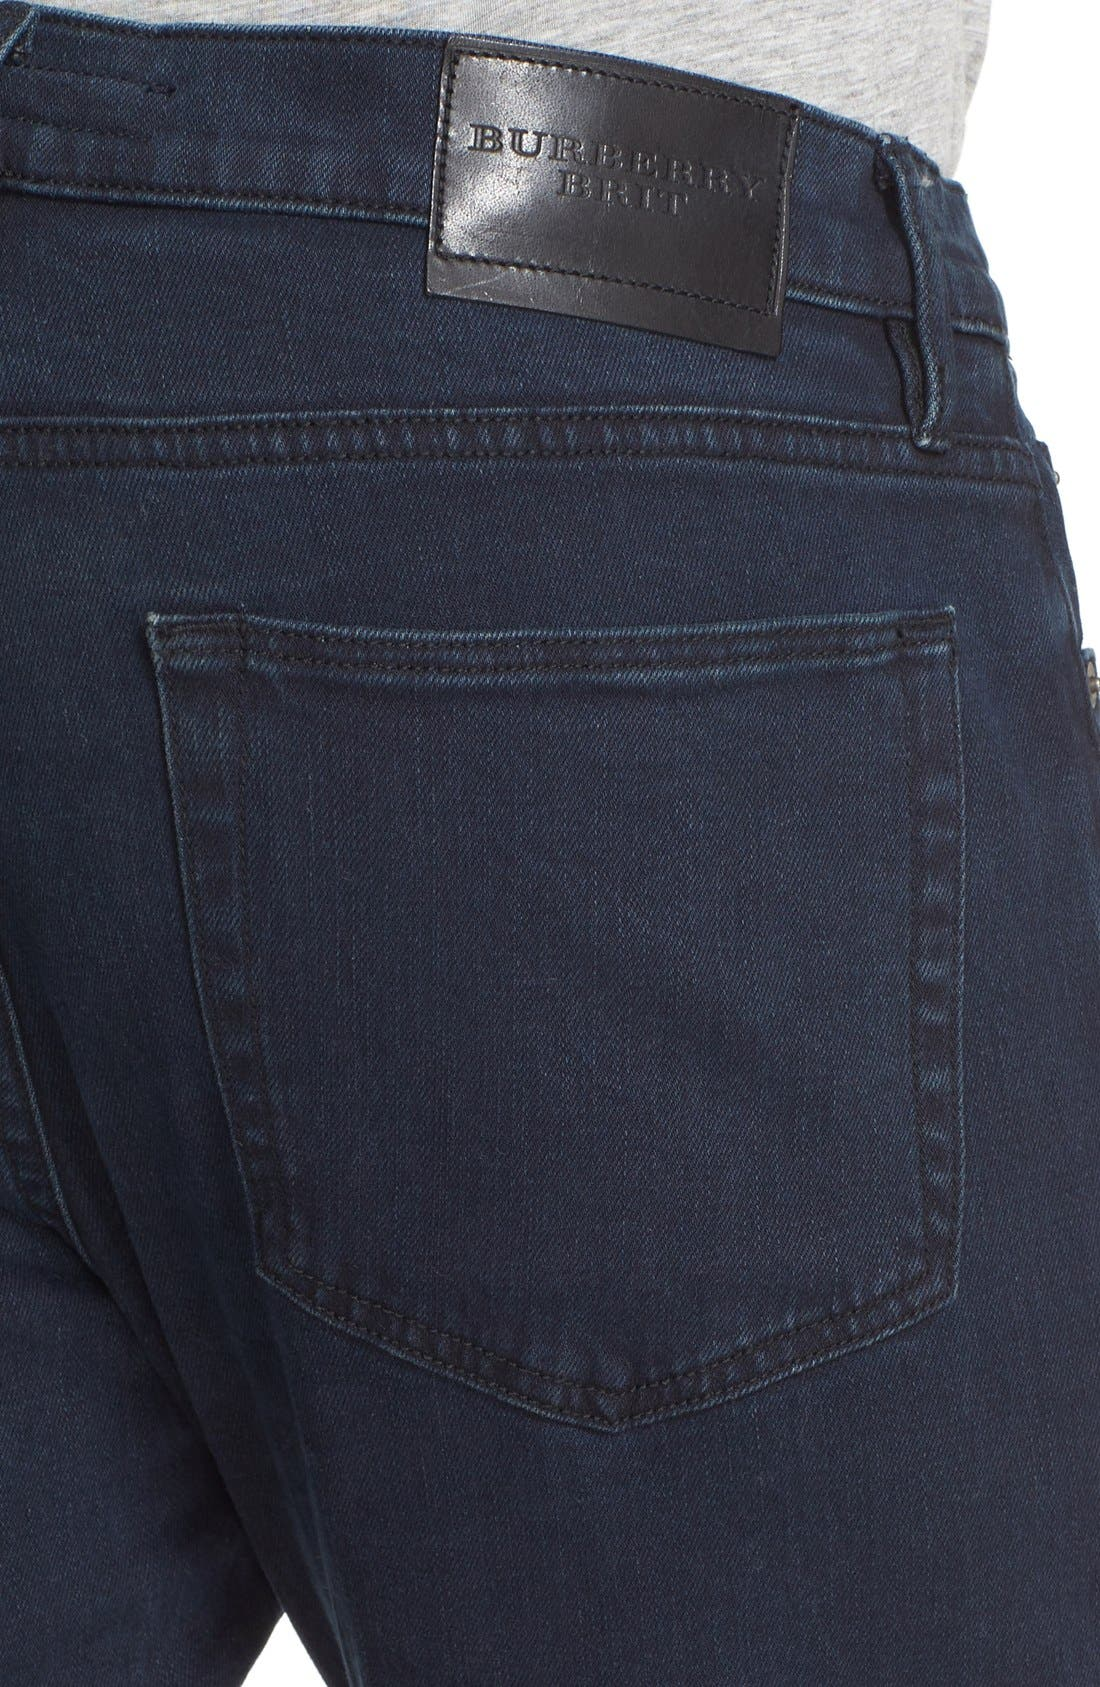 Straight Leg Jeans Jeans,                             Alternate thumbnail 4, color,                             404